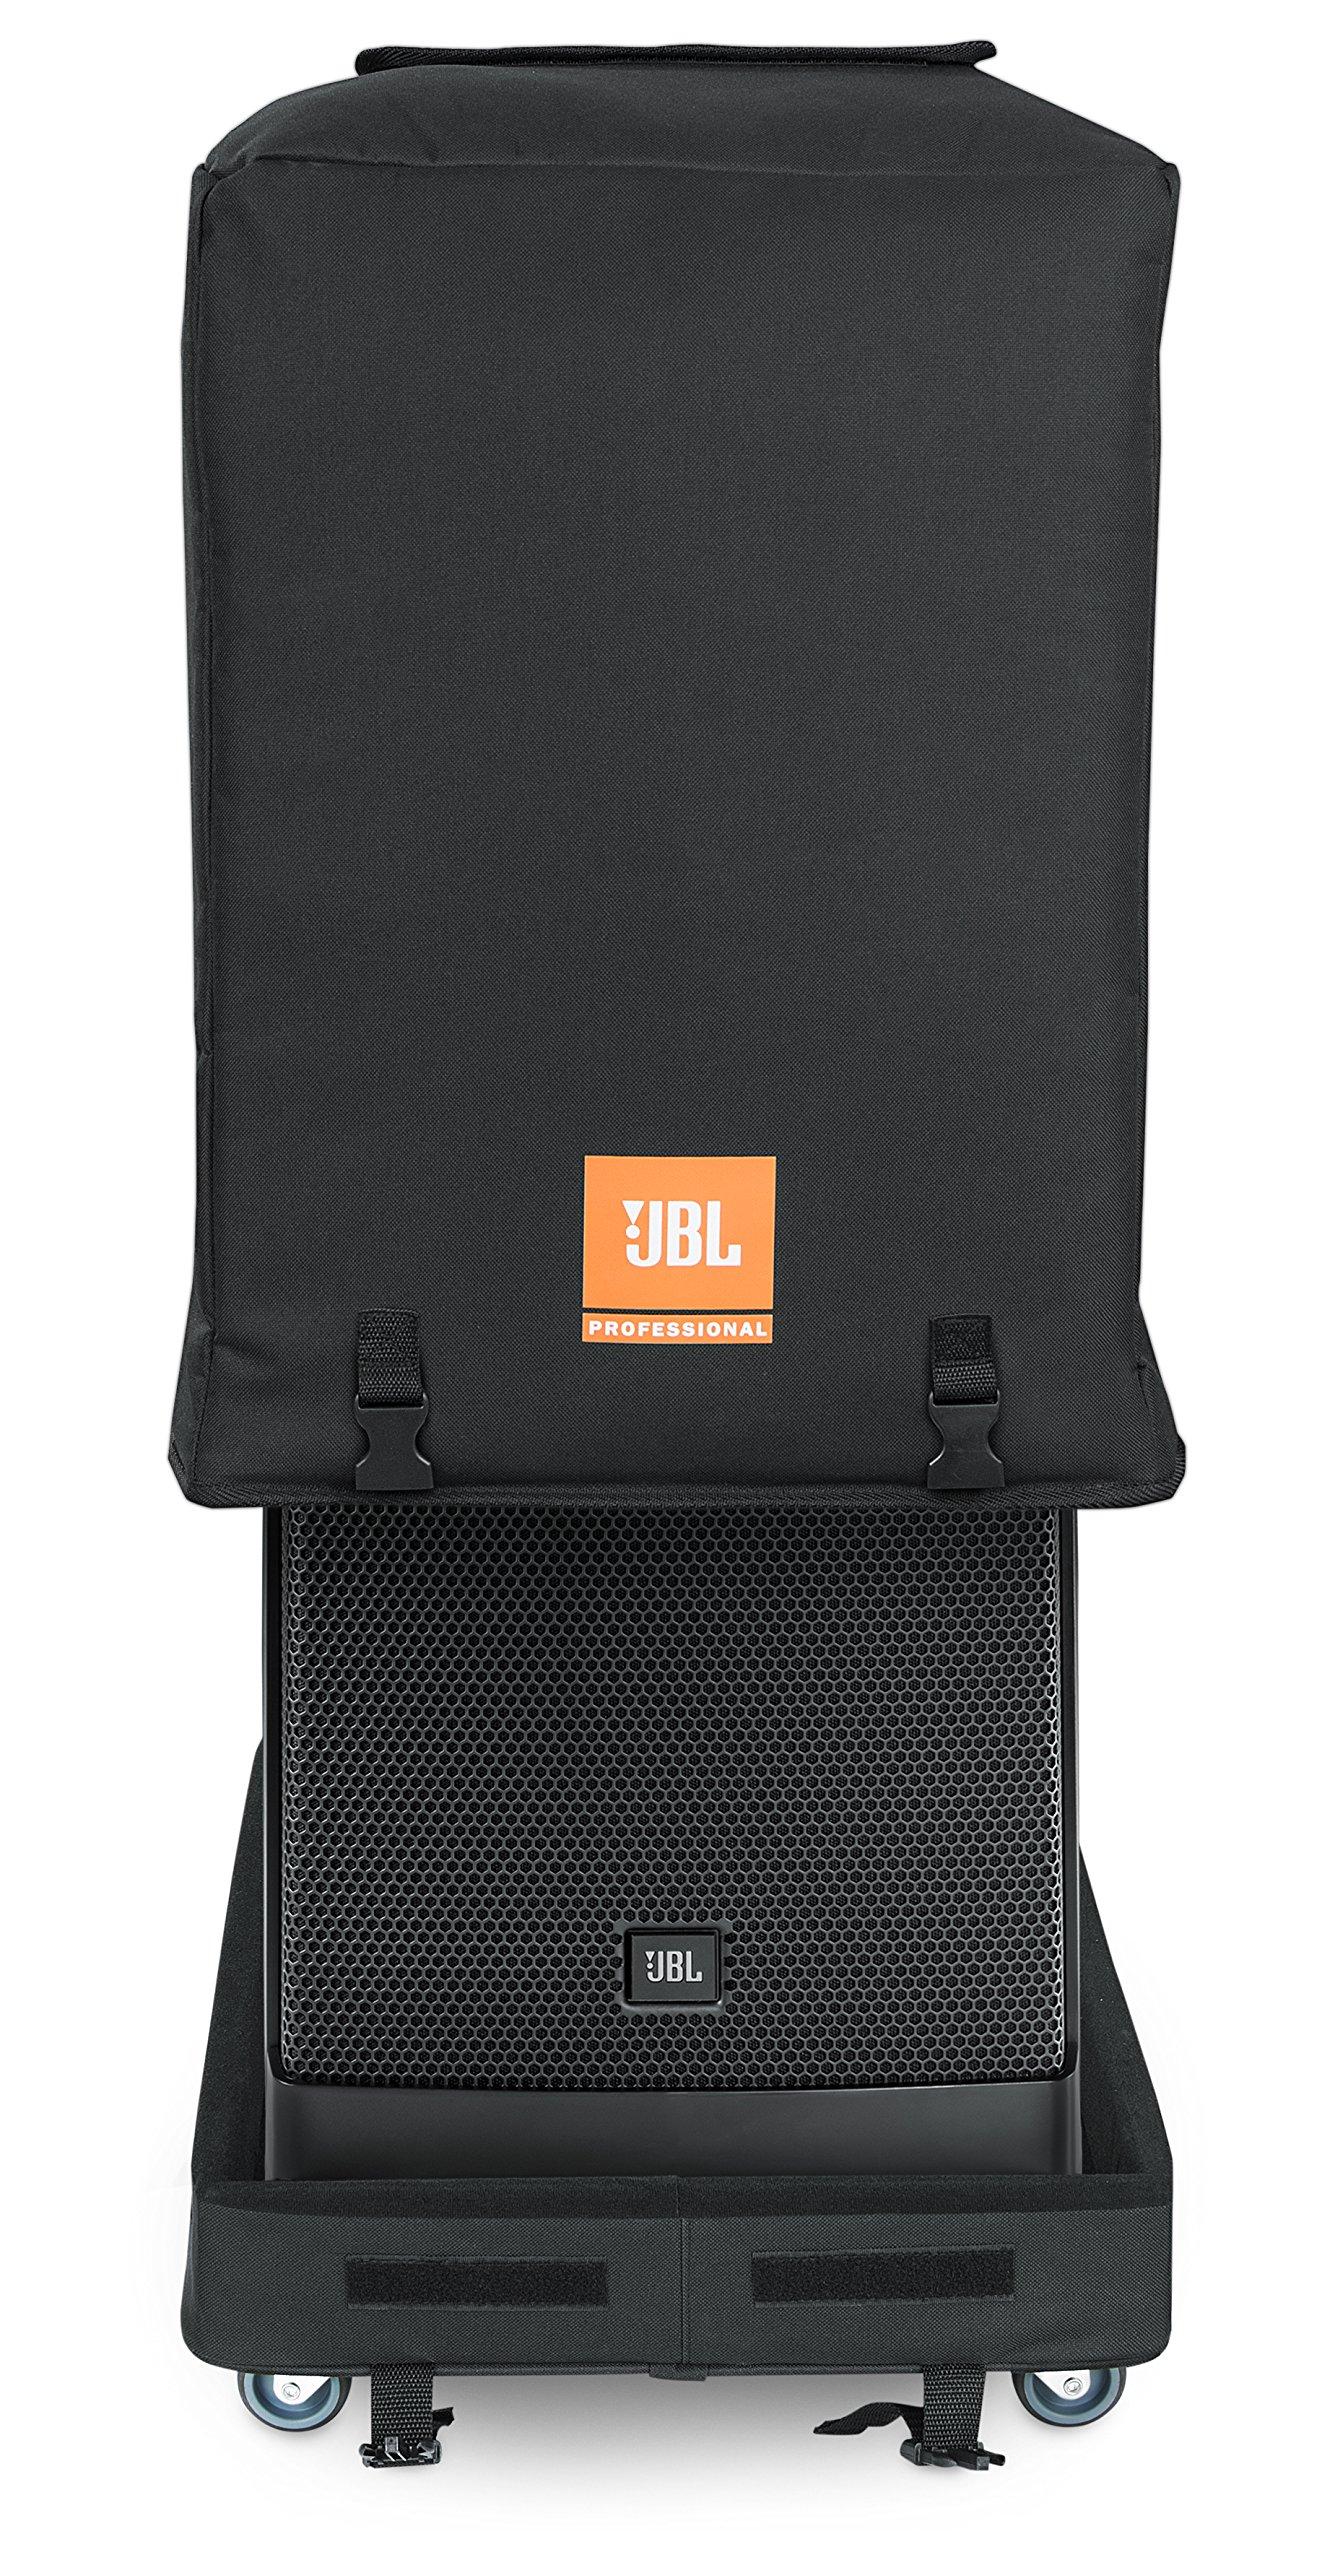 JBL Bags EON-ONE-TRANSPORTER Rolling Case for JBL EON ONE Speaker System by JBL Bags